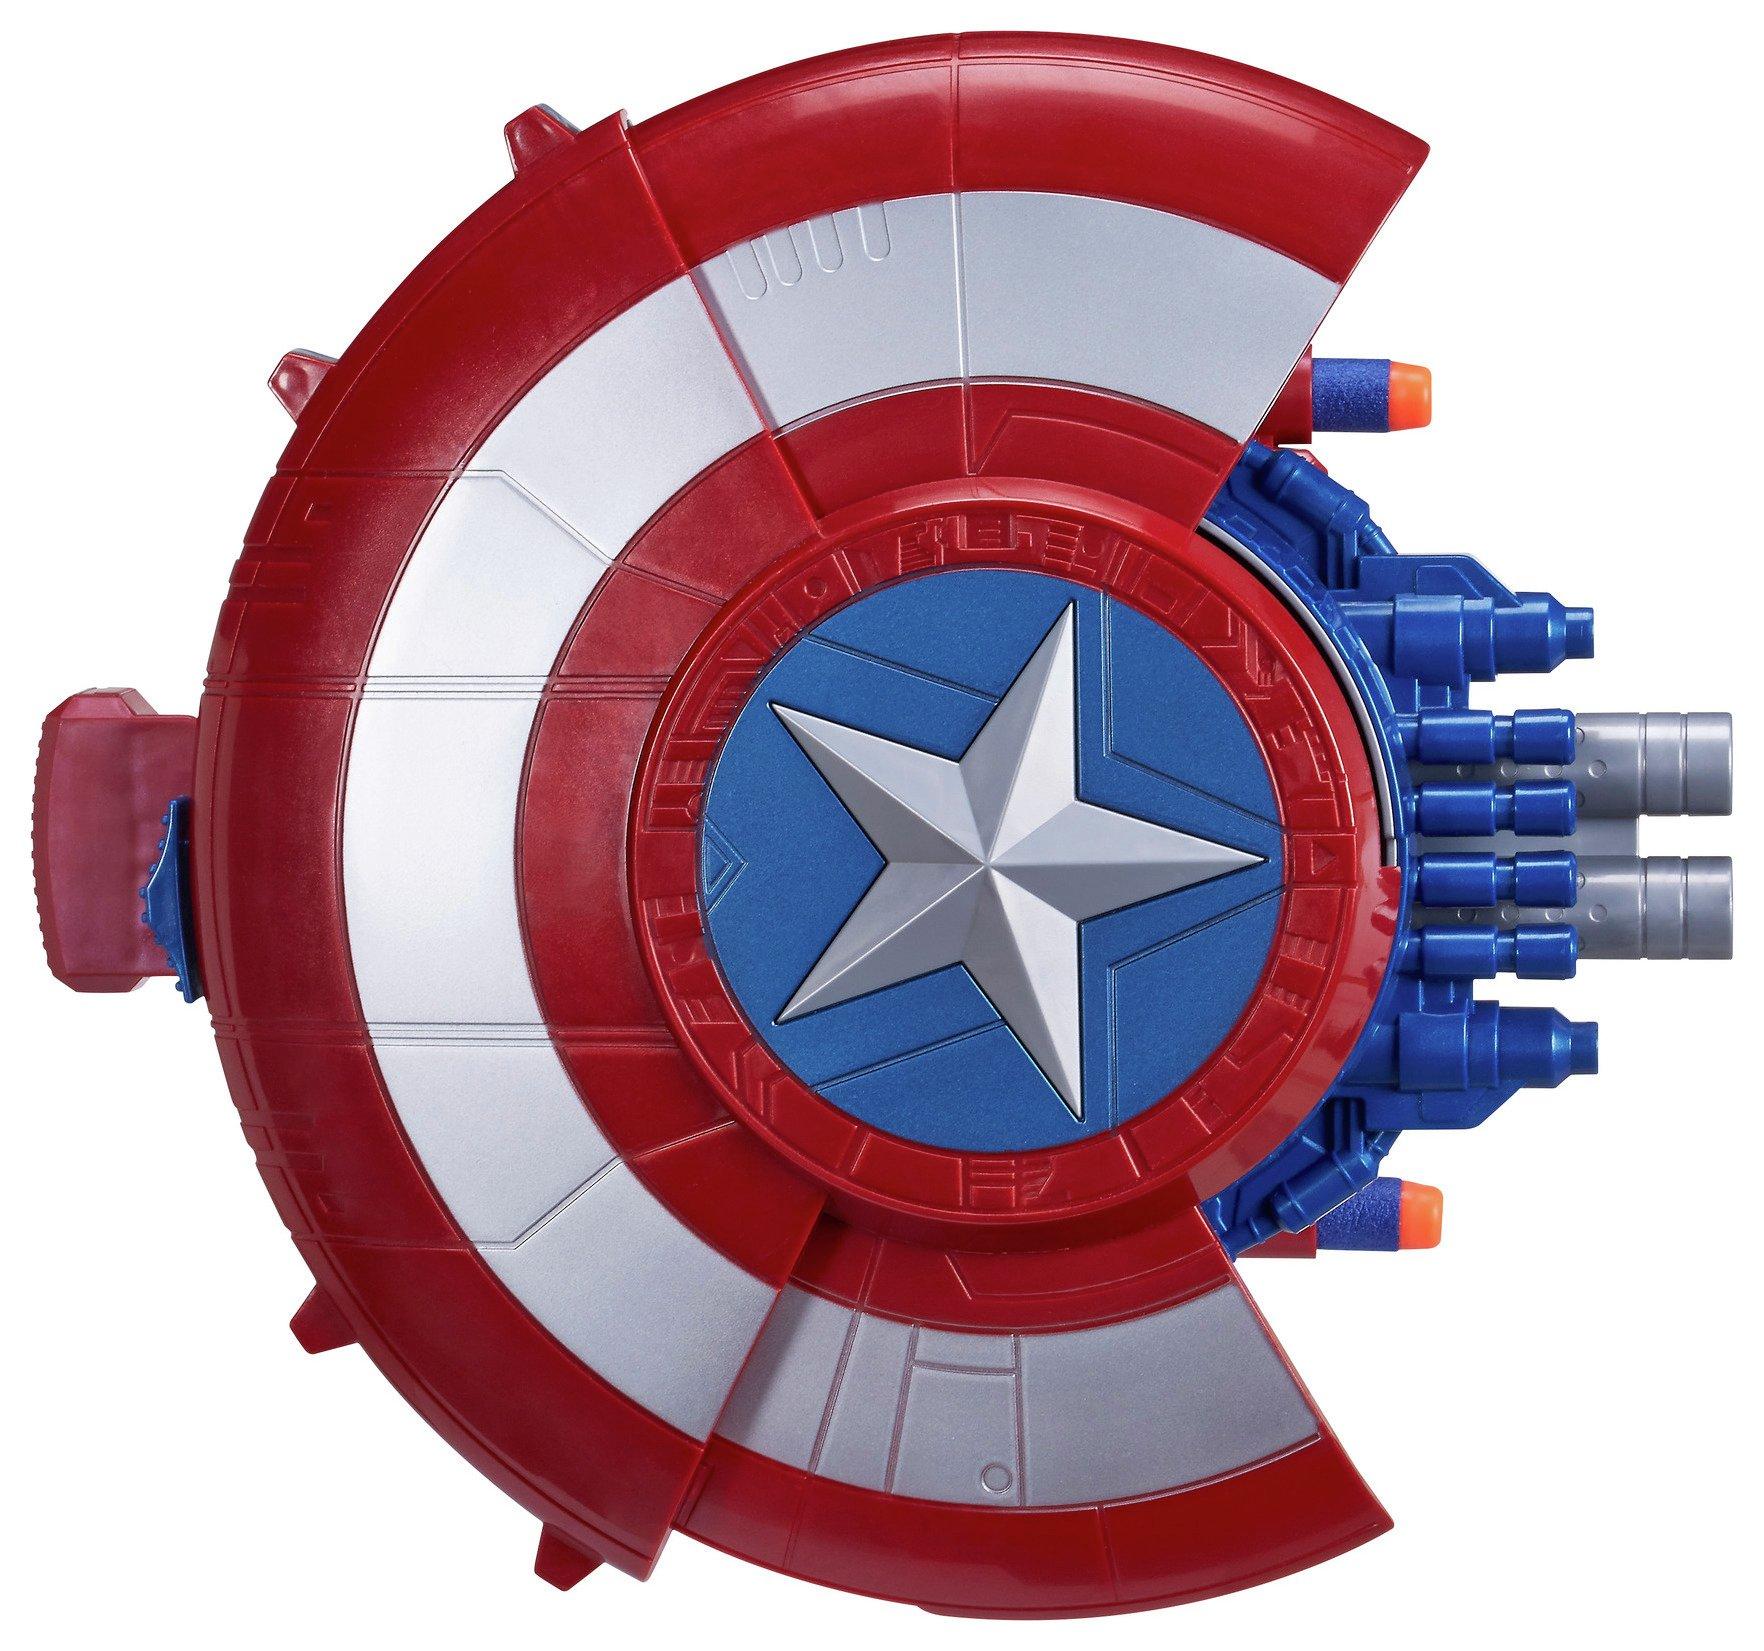 Image of Marvel Captain America: Civil War Blaster Reveal Shield